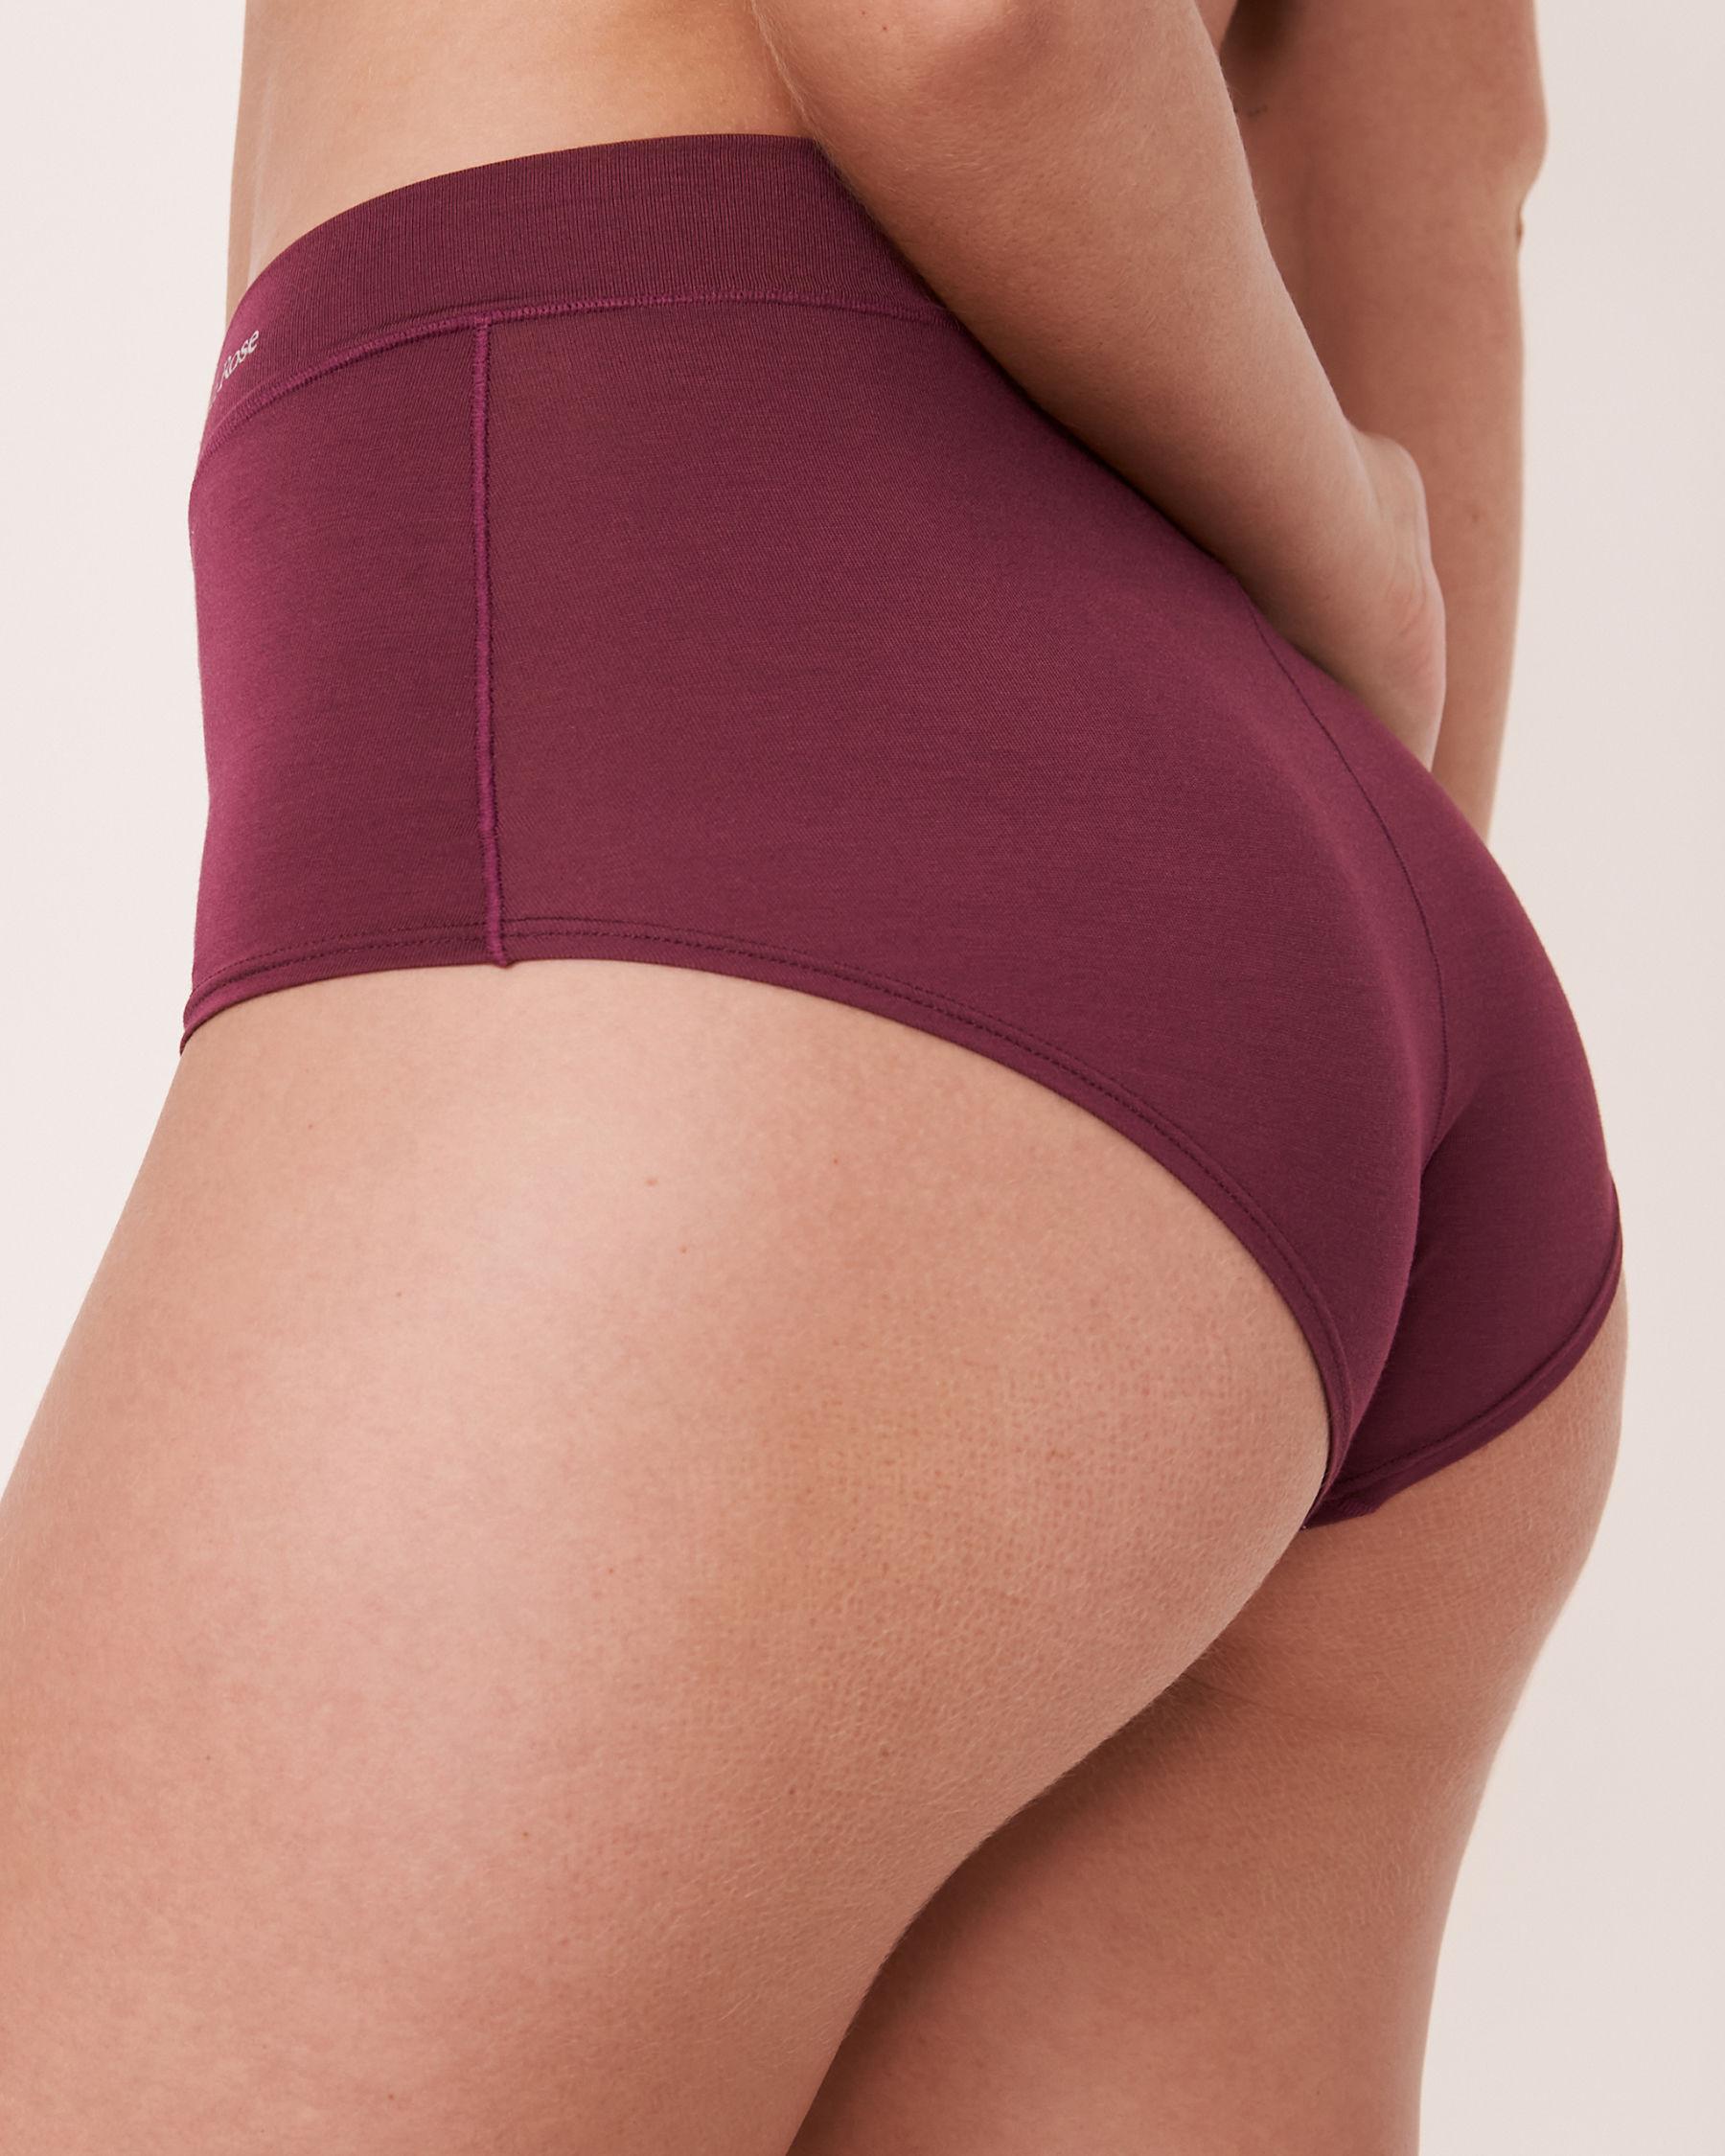 LA VIE EN ROSE High Waist Boyleg Panty Prune 20200076 - View2